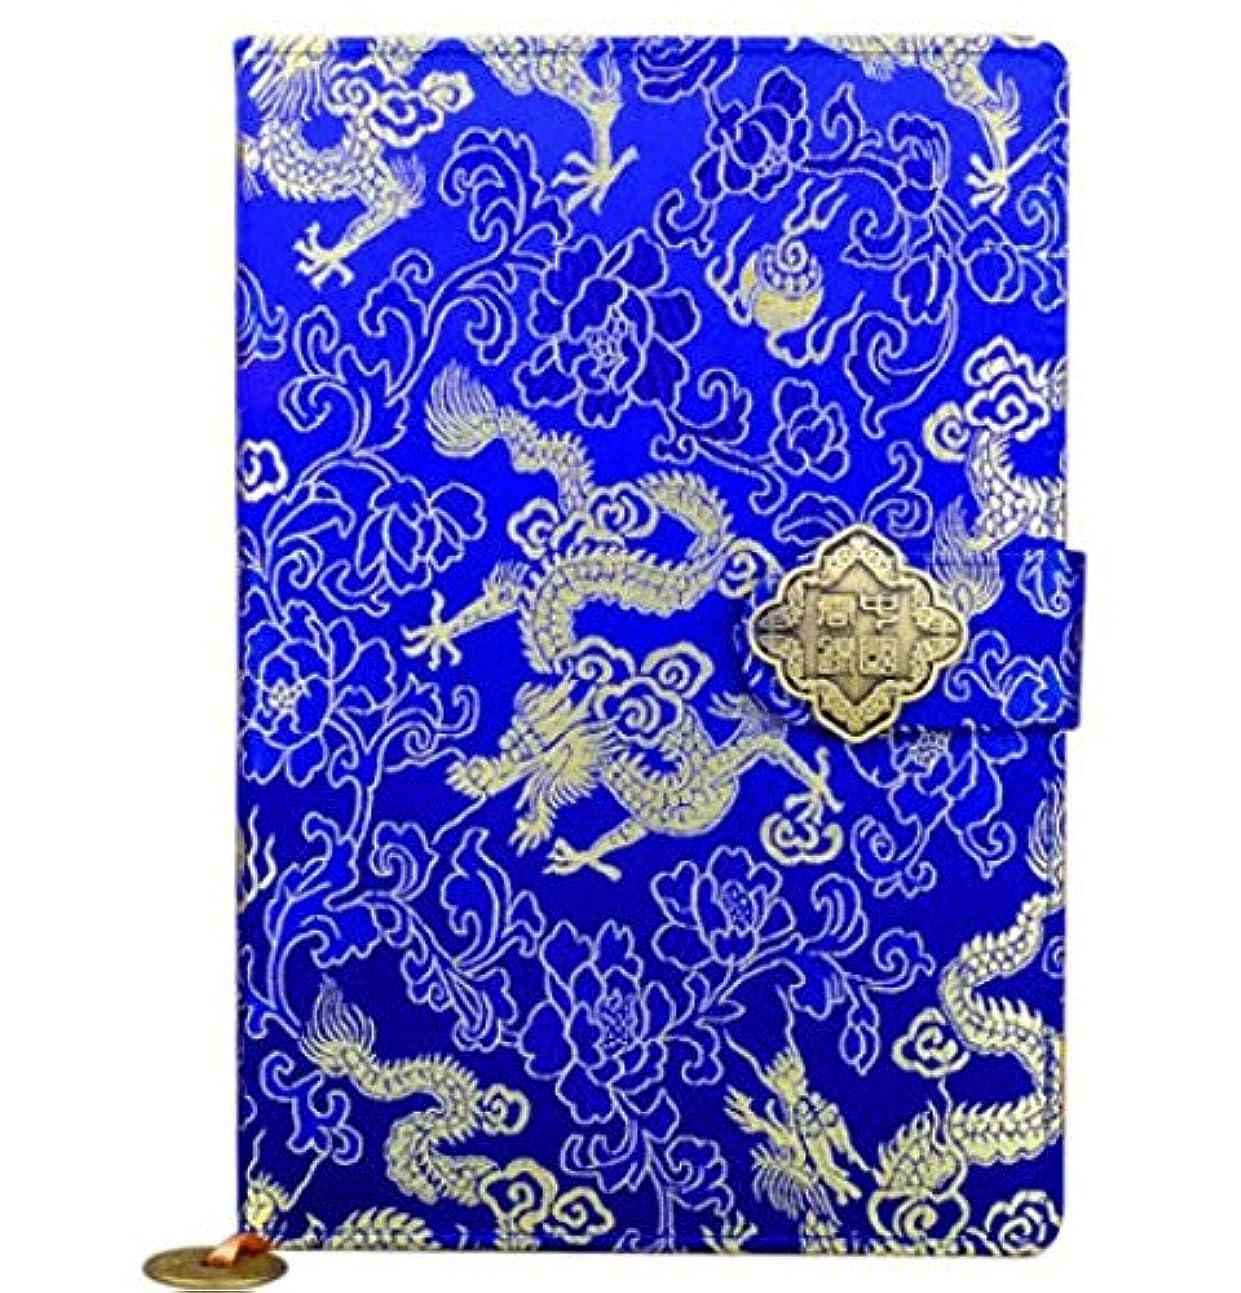 【Deli】 ノート 布表紙 中国的 刺繍 美しい ブルー × 龍 古銭 ブックマーク付き (ゴールド) [並行輸入品]